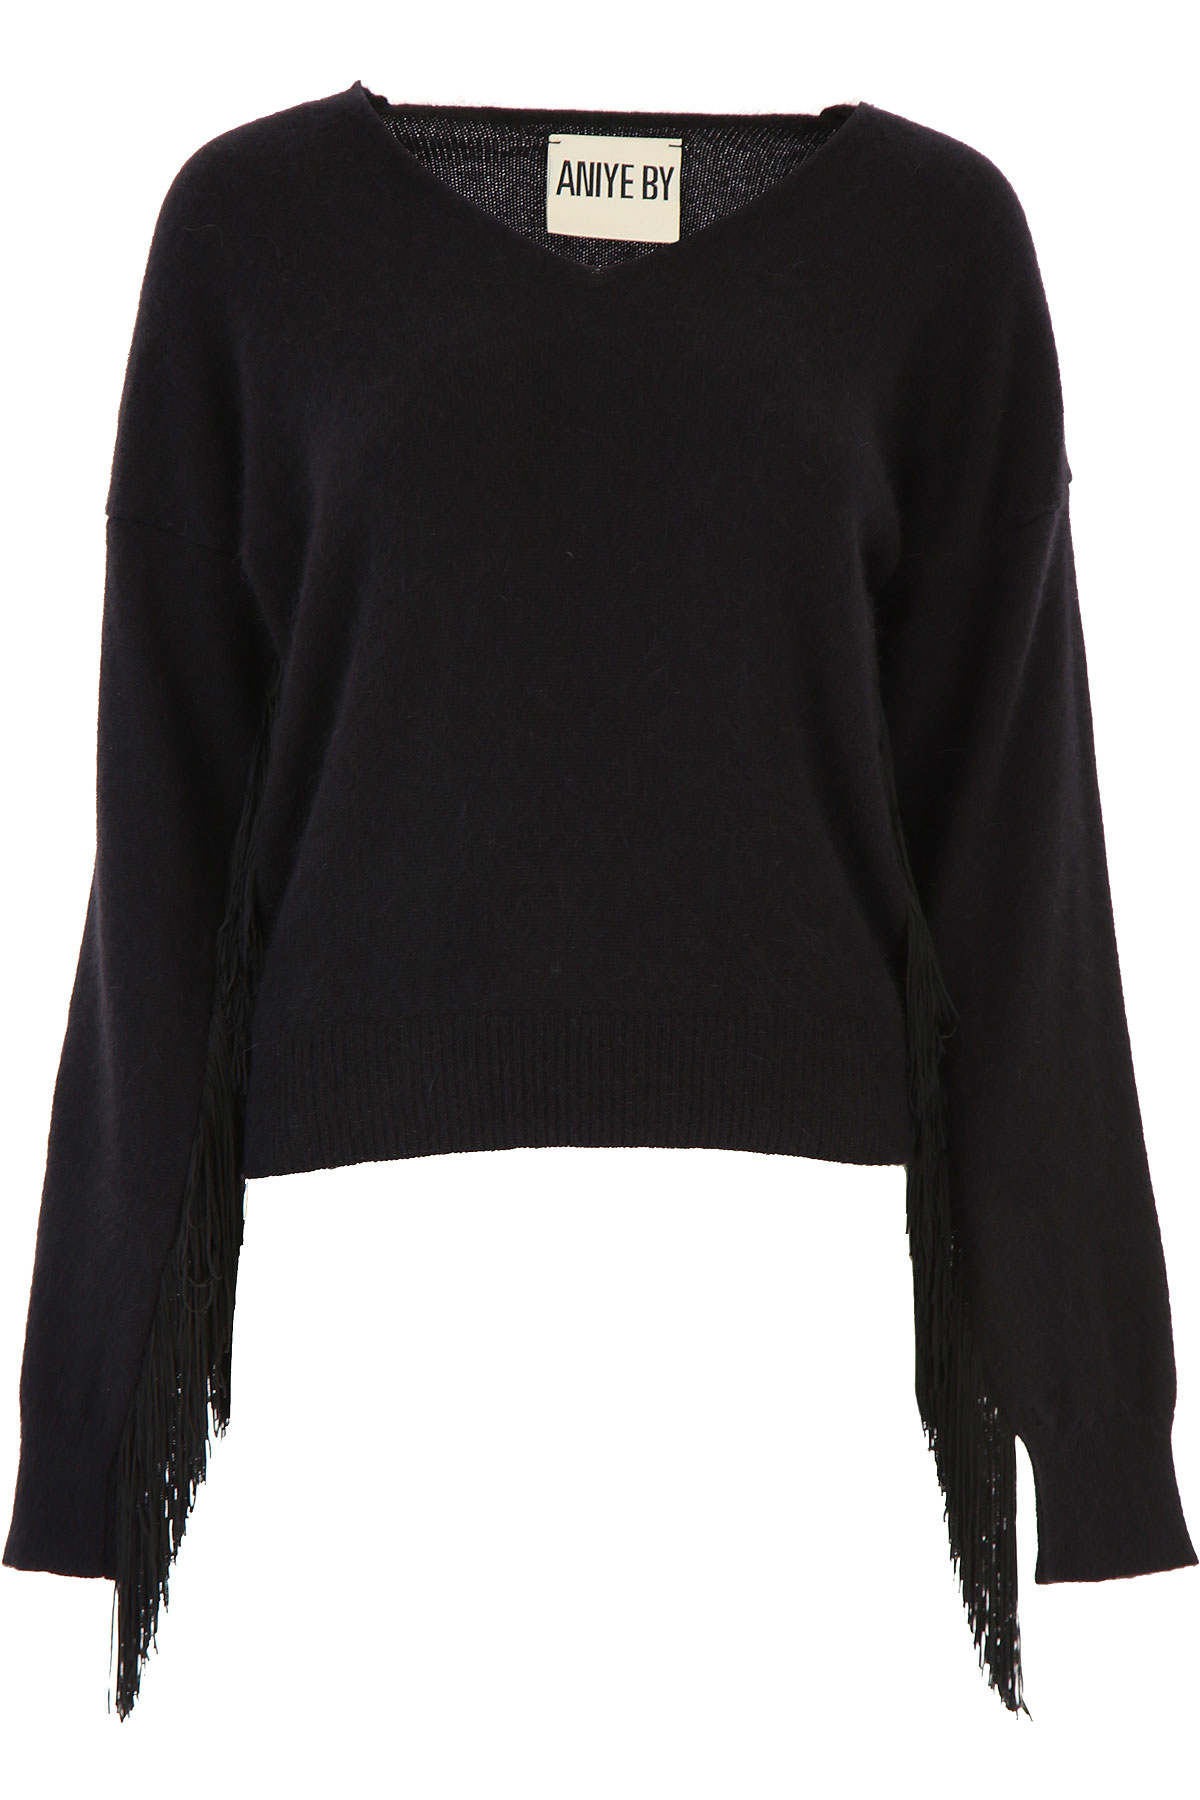 Aniye By Sweater for Women Jumper On Sale, Black, Angora, 2019, 4 6